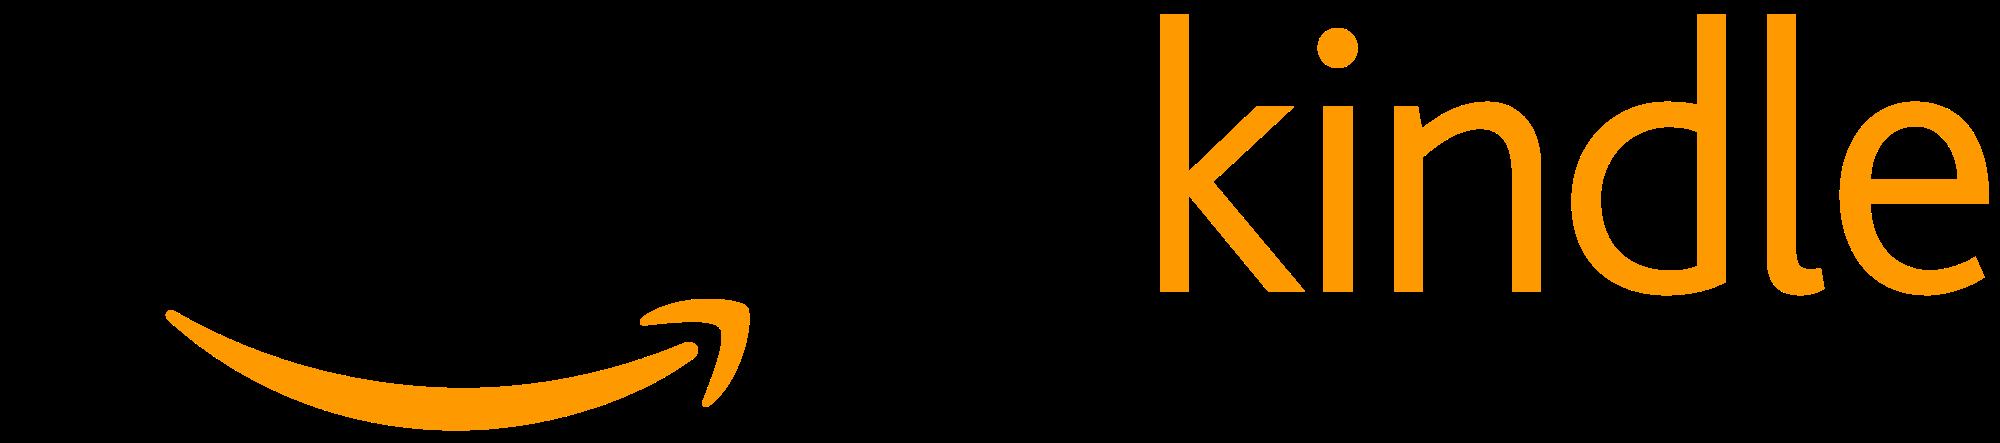 2000px-amazon_kindle_logo-svg